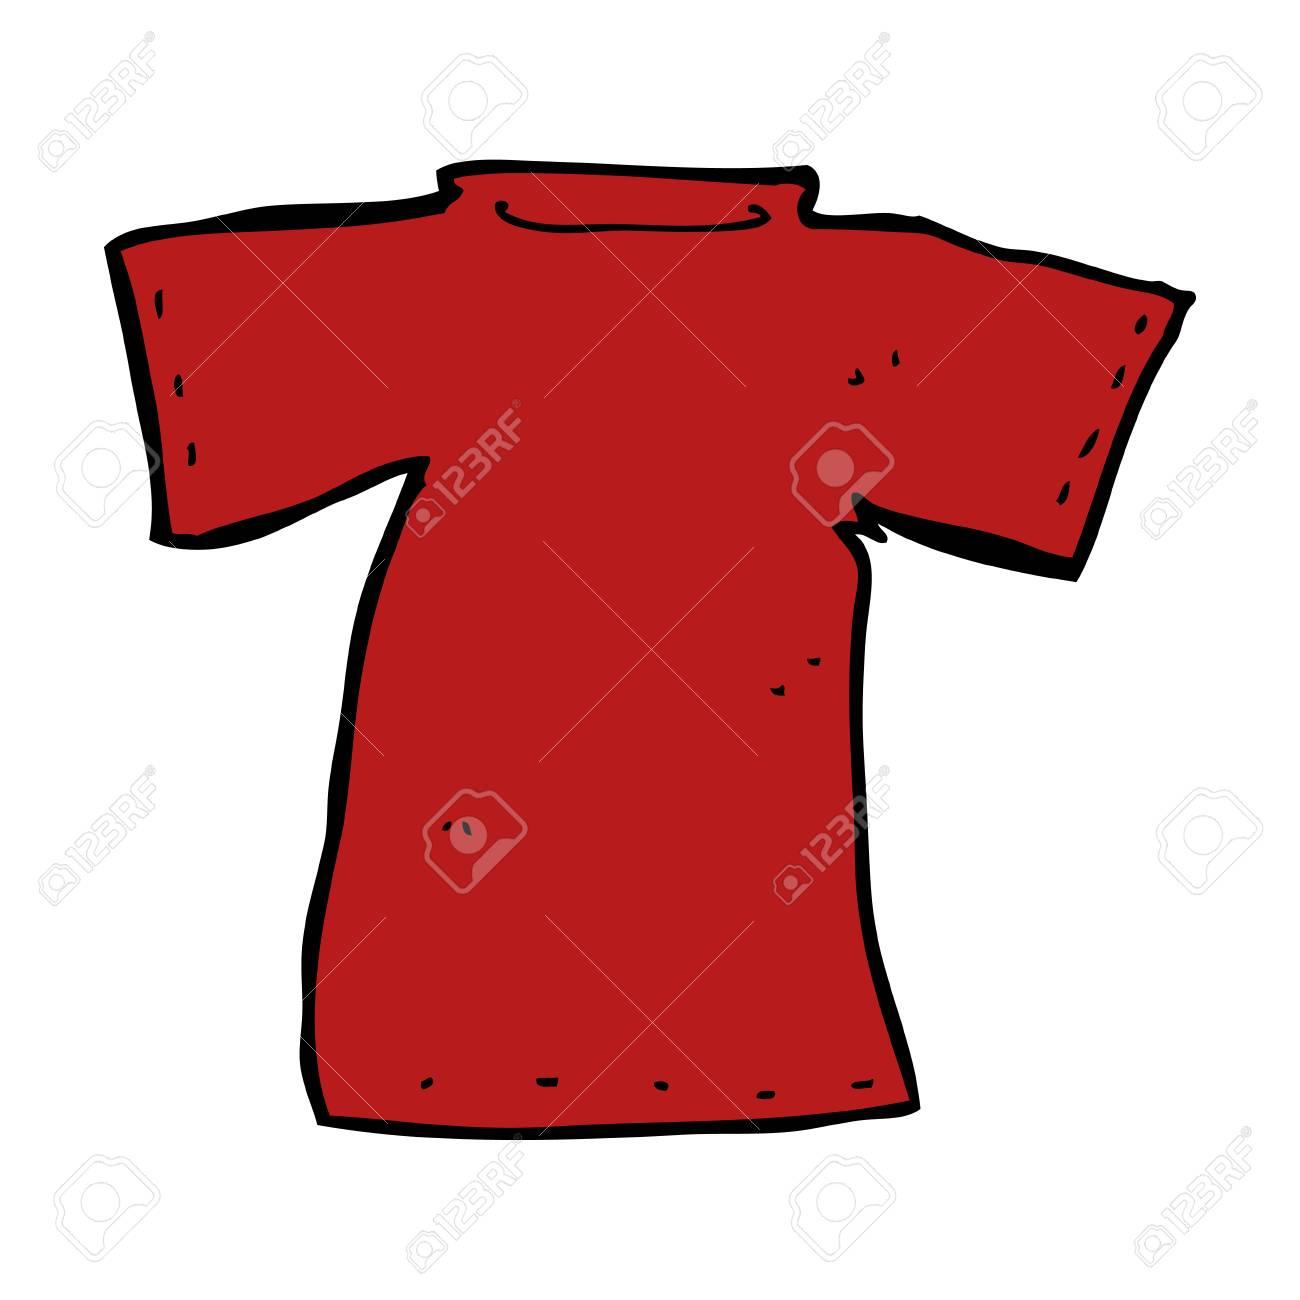 4c2f33cac Cartoon T Shirt Royalty Free Cliparts, Vectors, And Stock ...